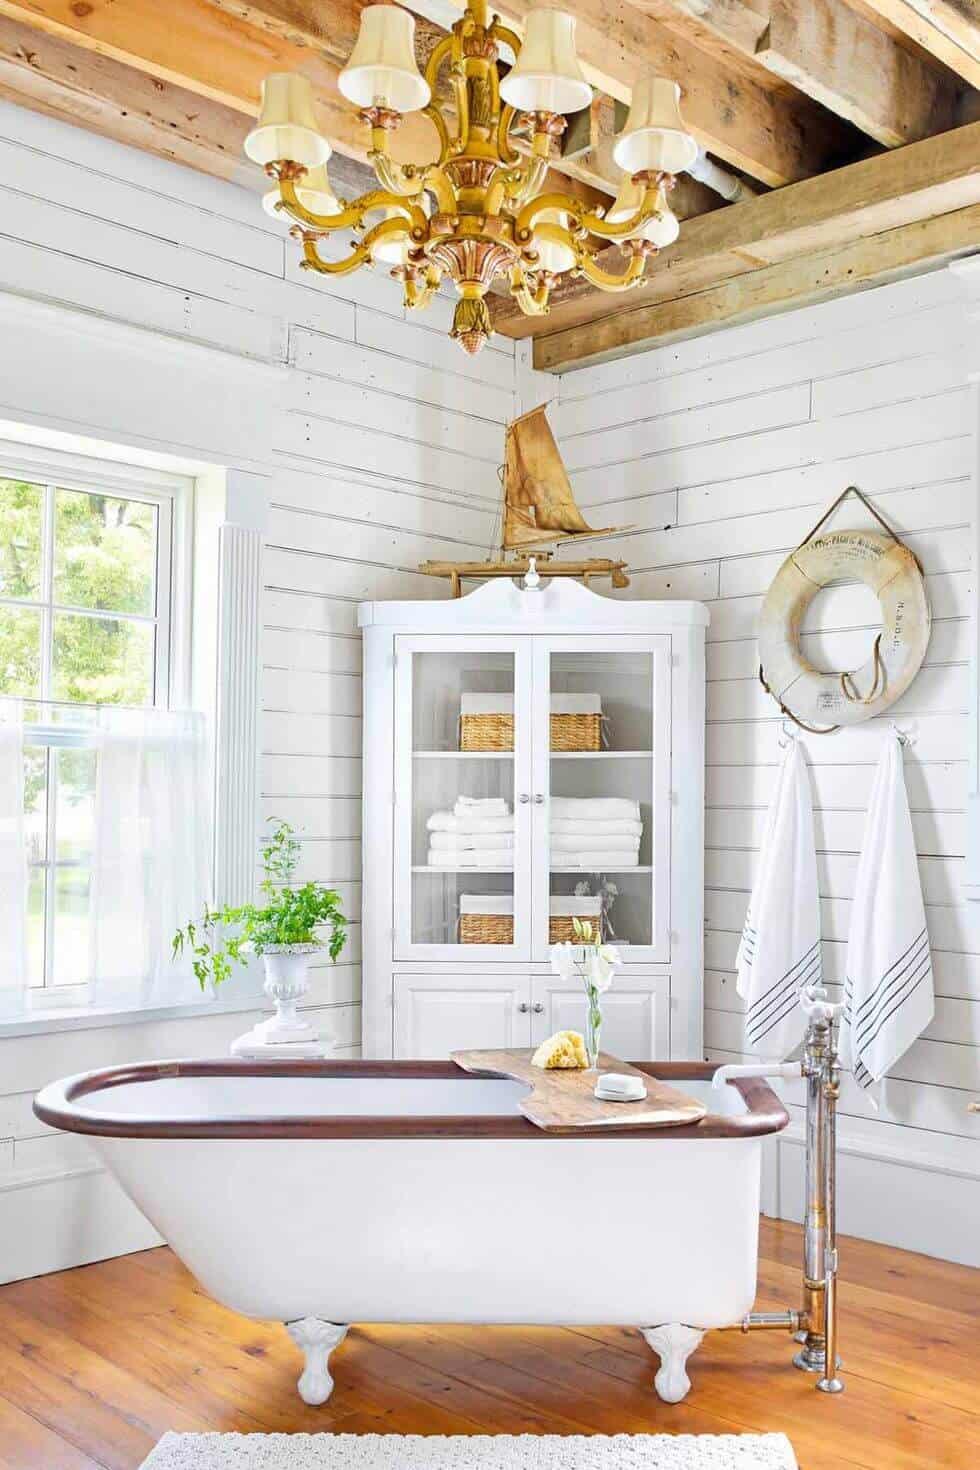 18 Refreshing Rustic Bathroom Design Ideas - Rustic Bathroom Designs 6